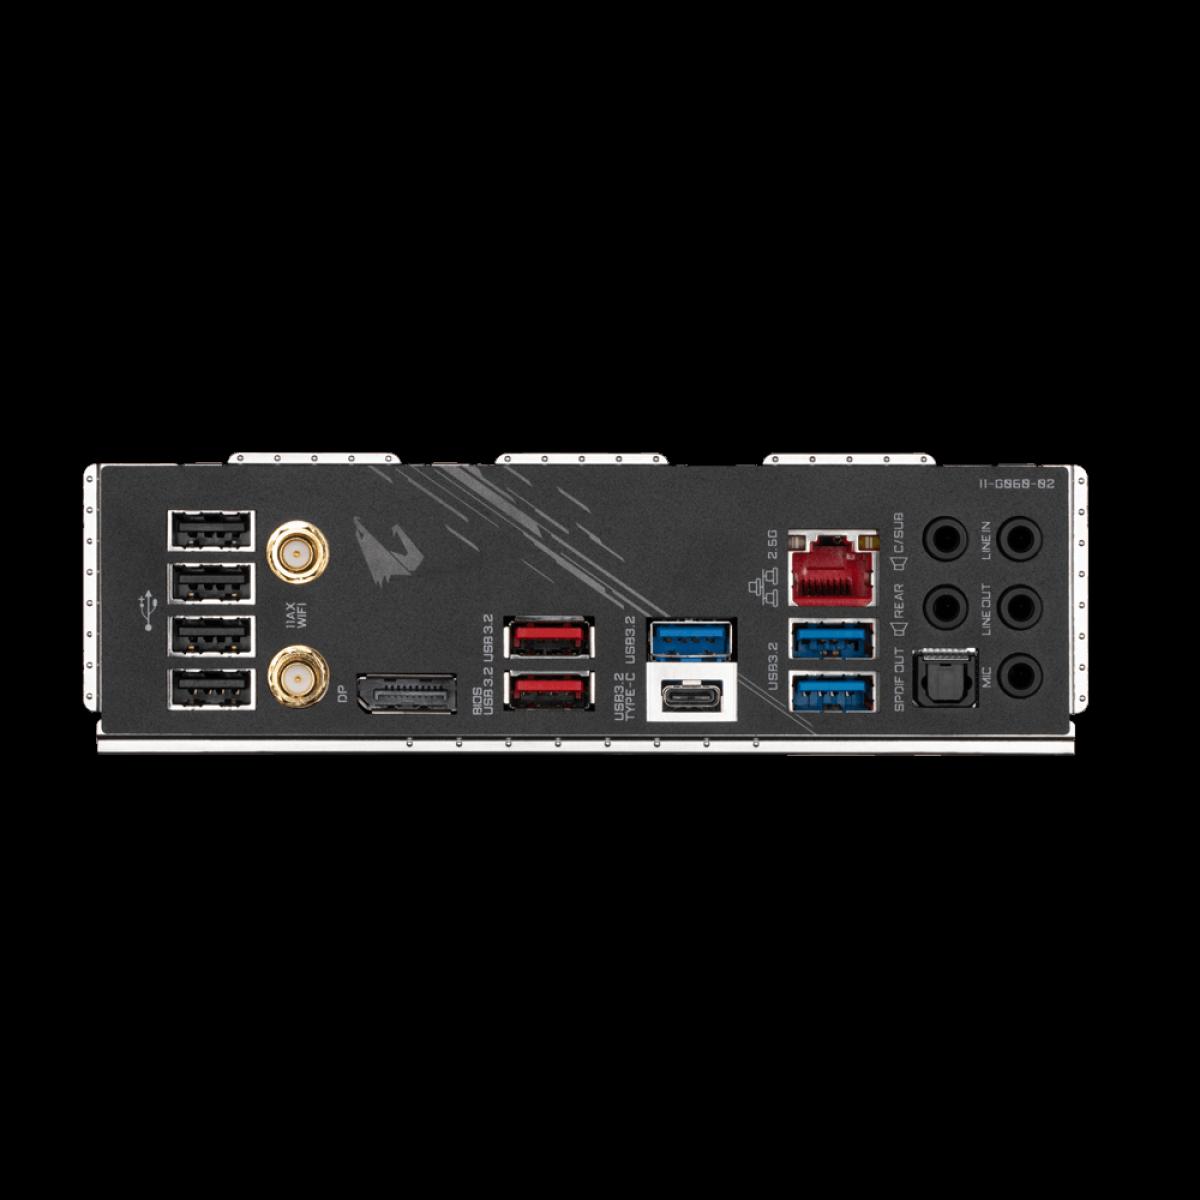 Placa Mãe Gigabyte Z590 AORUS ELITE AX, Wi-Fi, Chipset Z590, Intel LGA 1200, ATX, DDR4